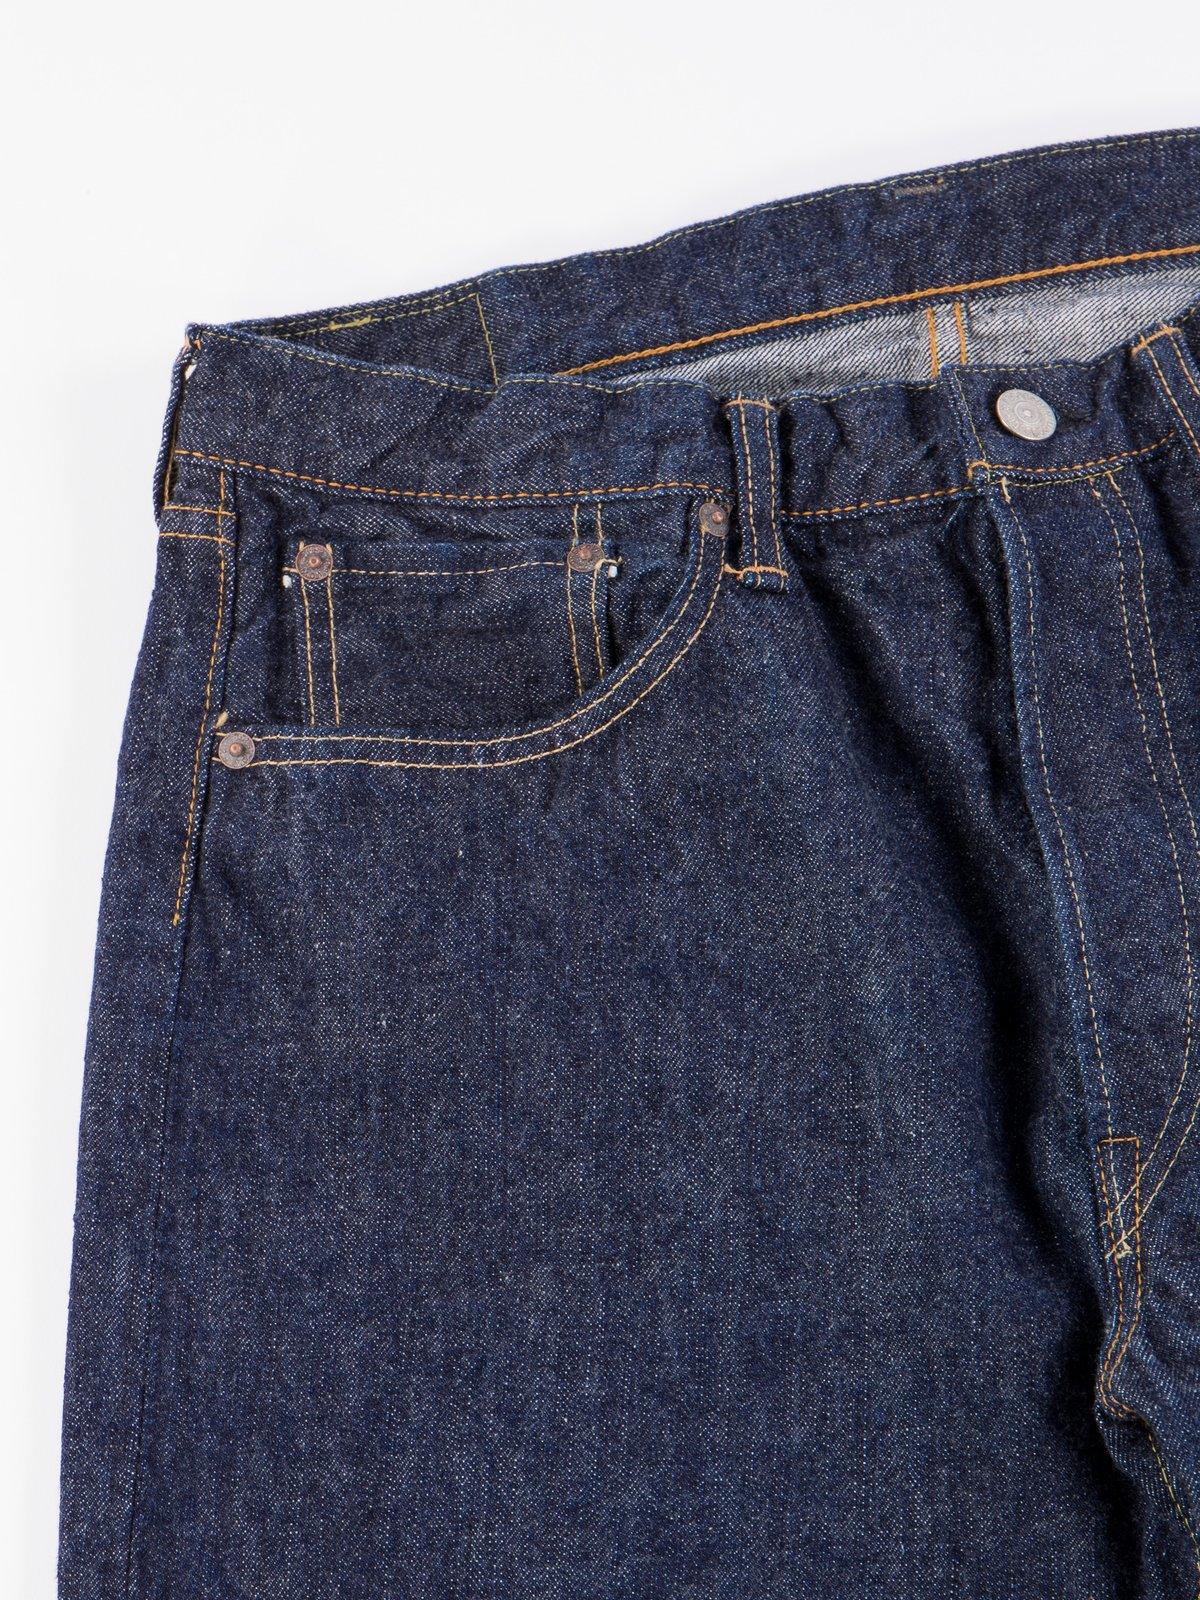 Indigo One Wash 105 Standard 5 Pocket Jean - Image 4